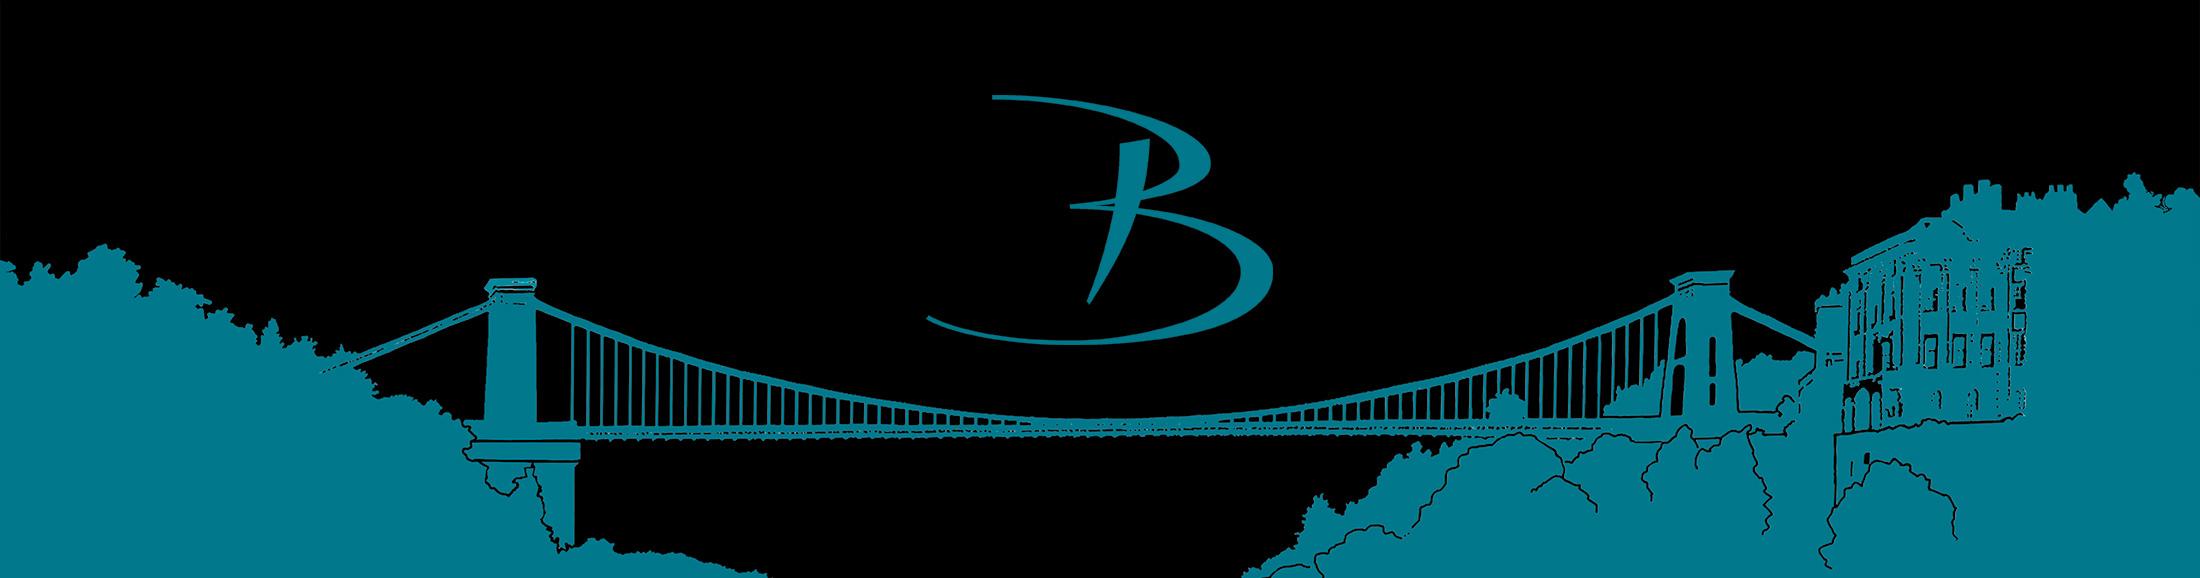 BCH-web-banner